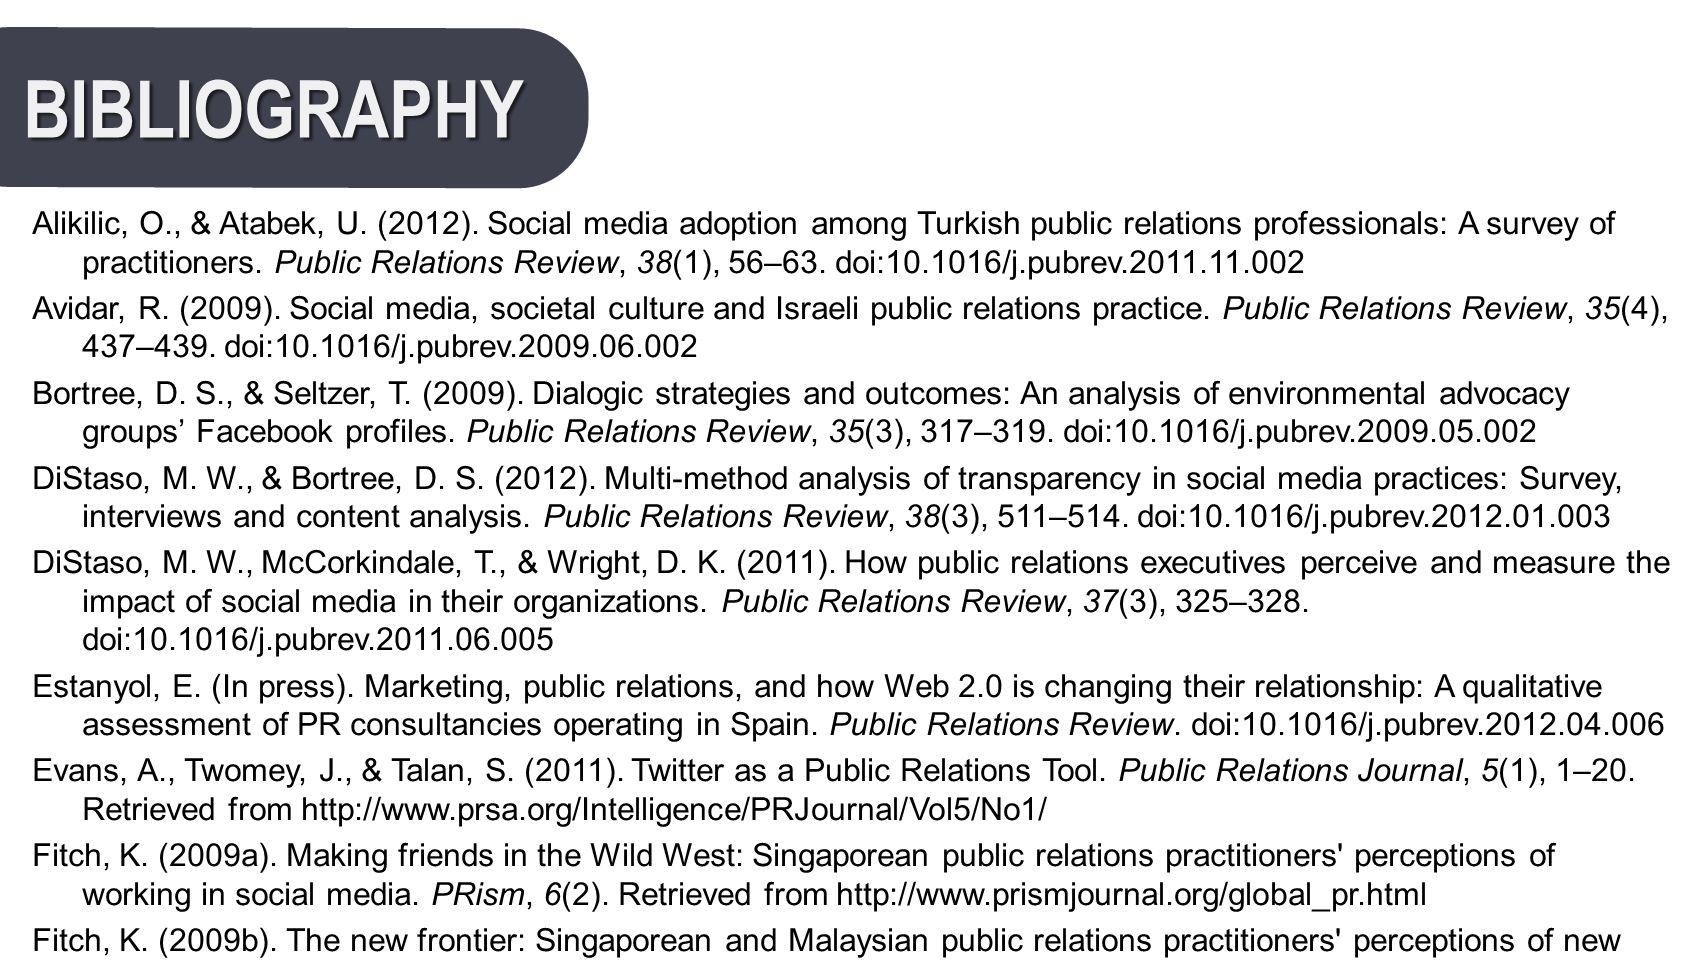 BIBLIOGRAPHY Alikilic, O., & Atabek, U. (2012).